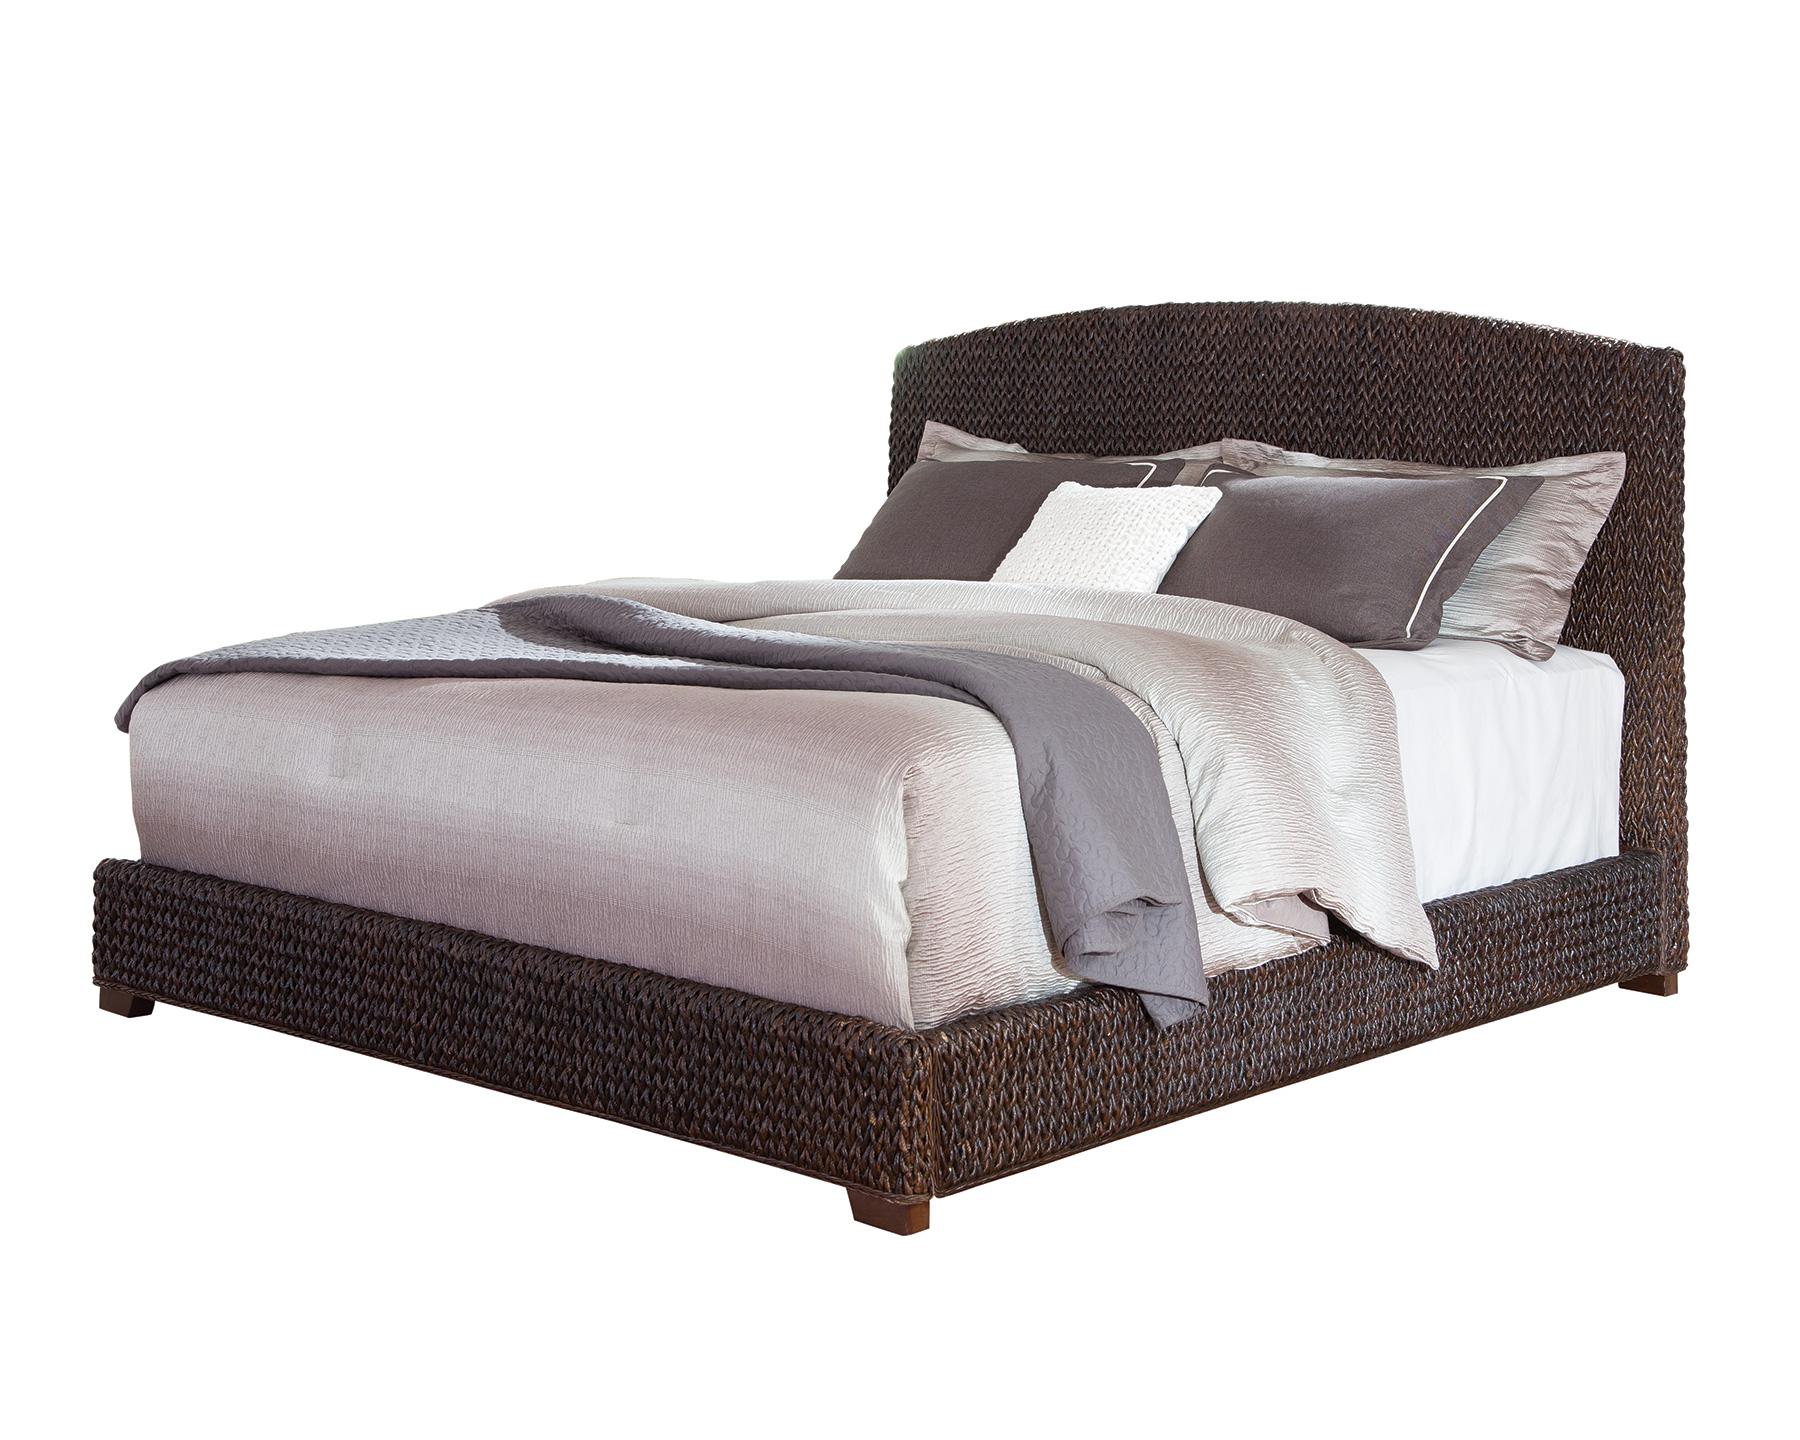 Coaster Laughton Eastern King Bed - Item Number: 300500KE